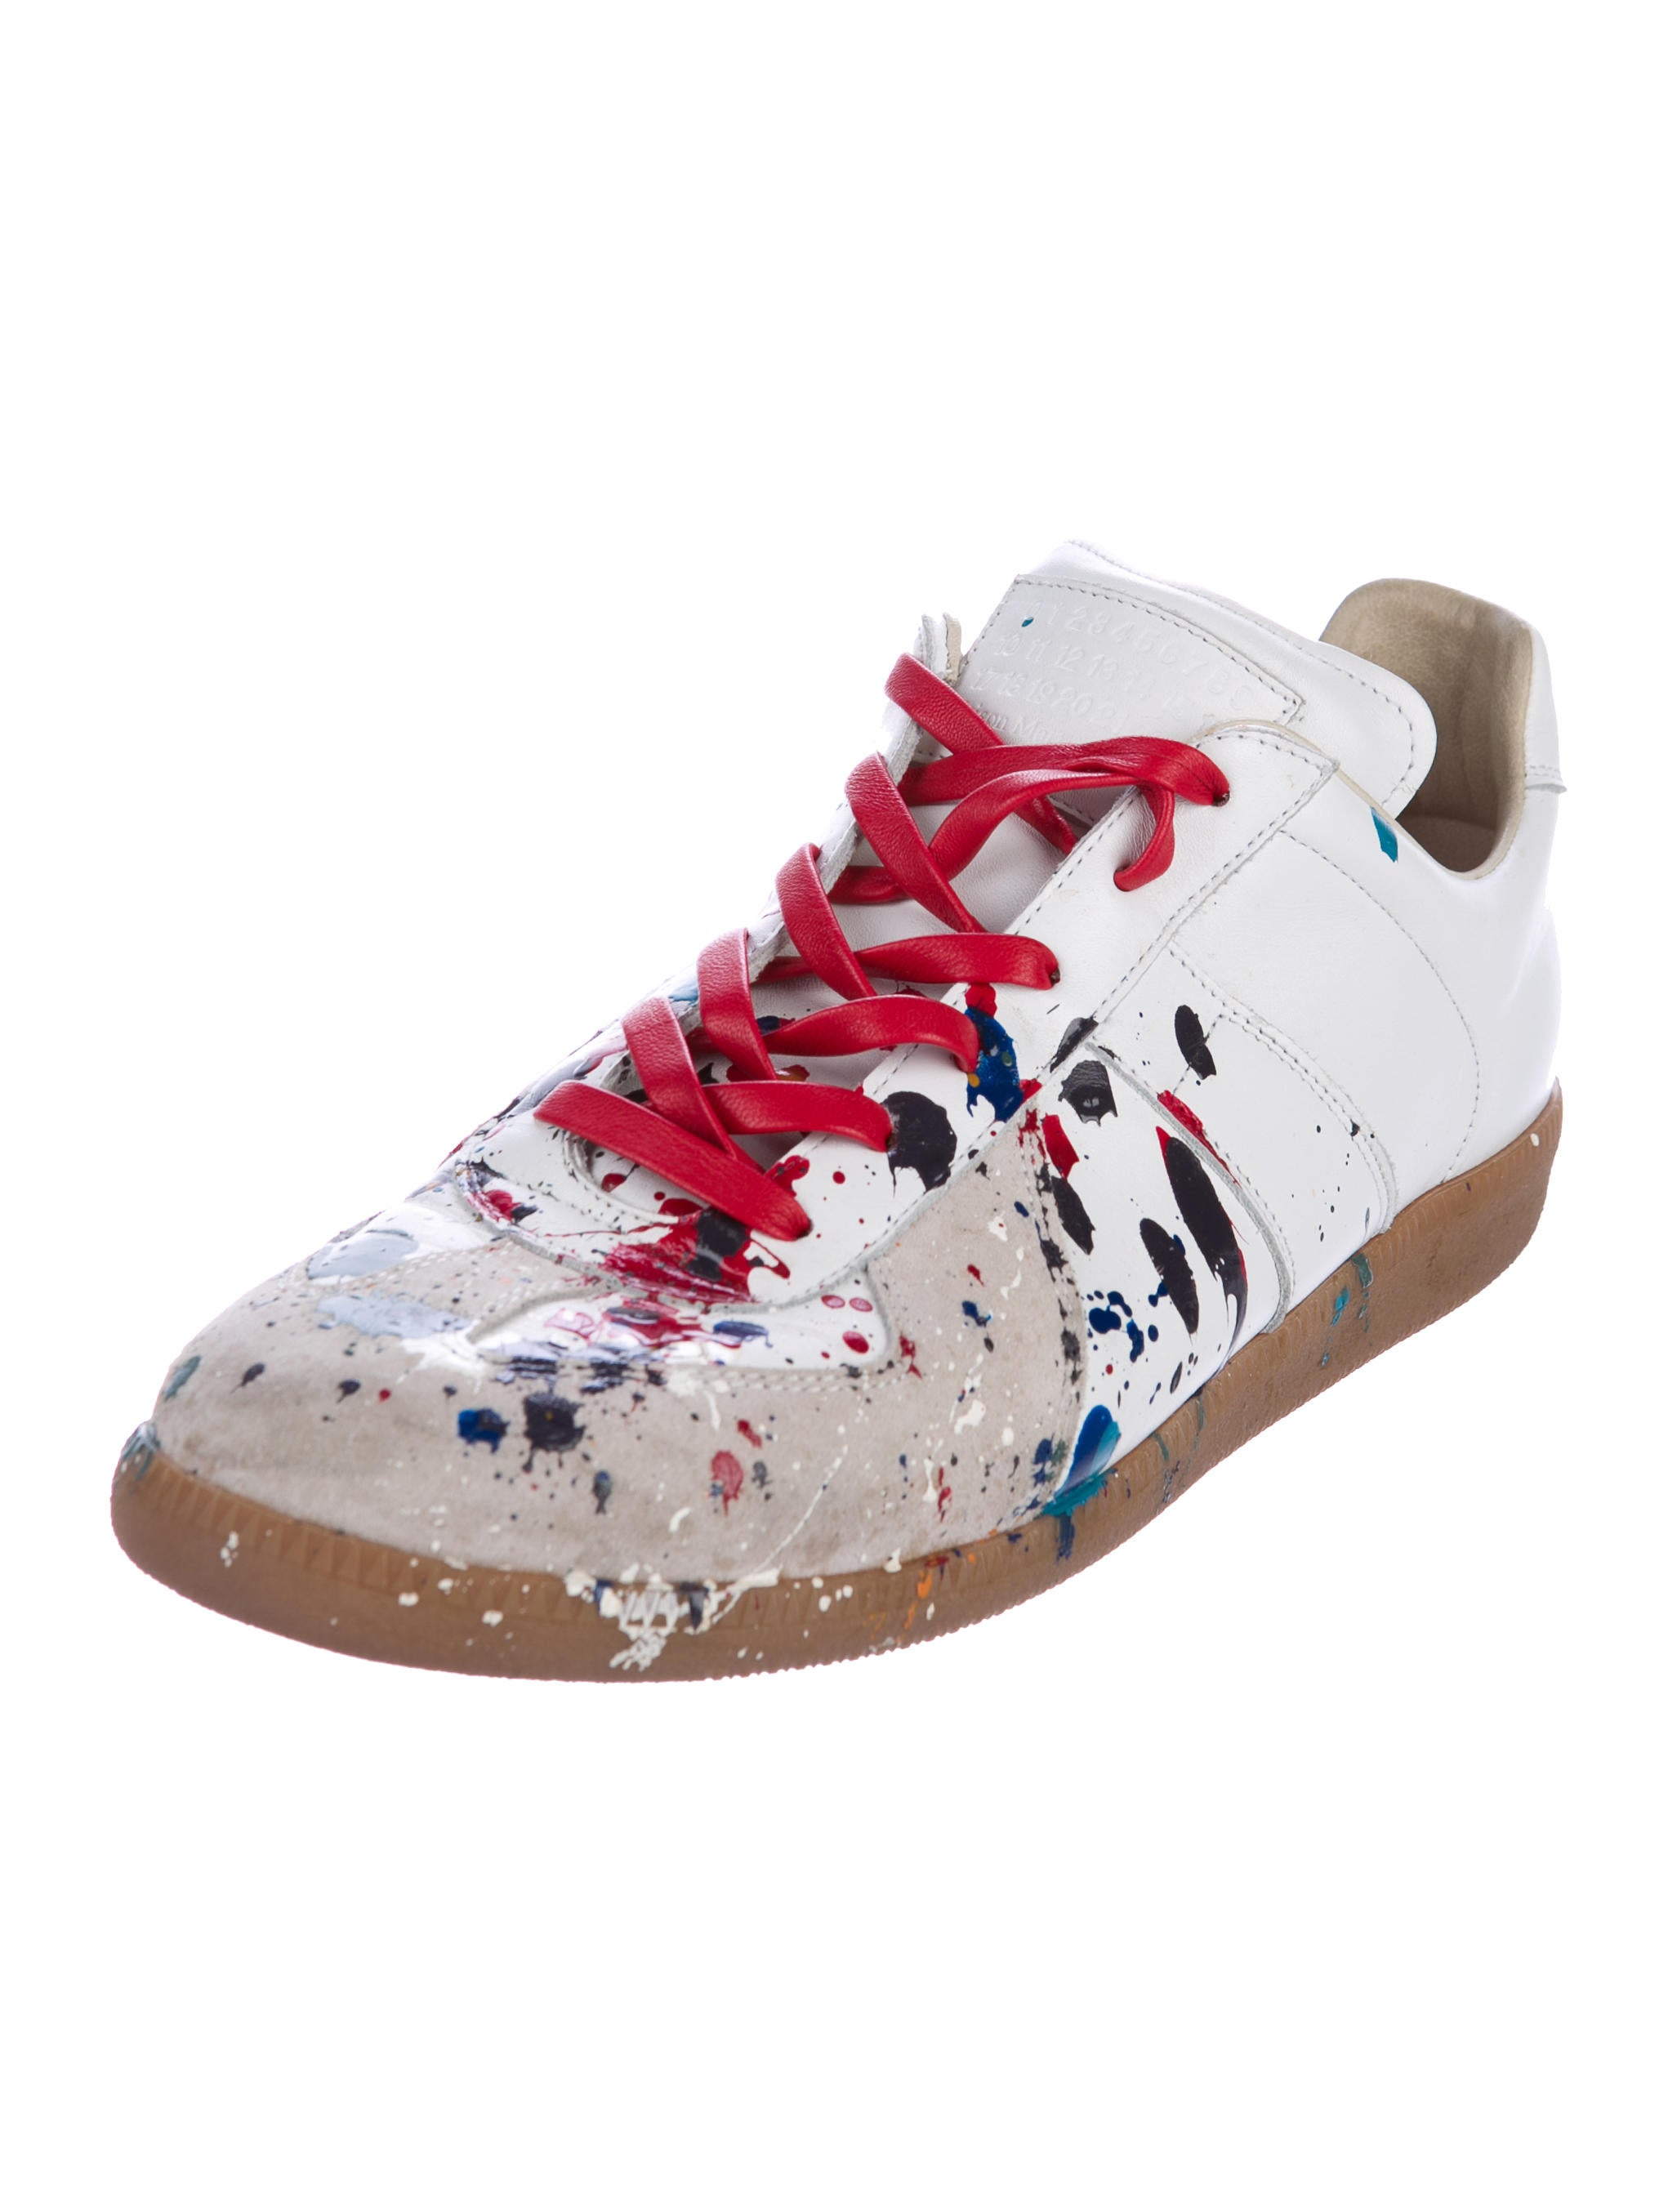 Maison Margiela White Painted Sneakers Sale